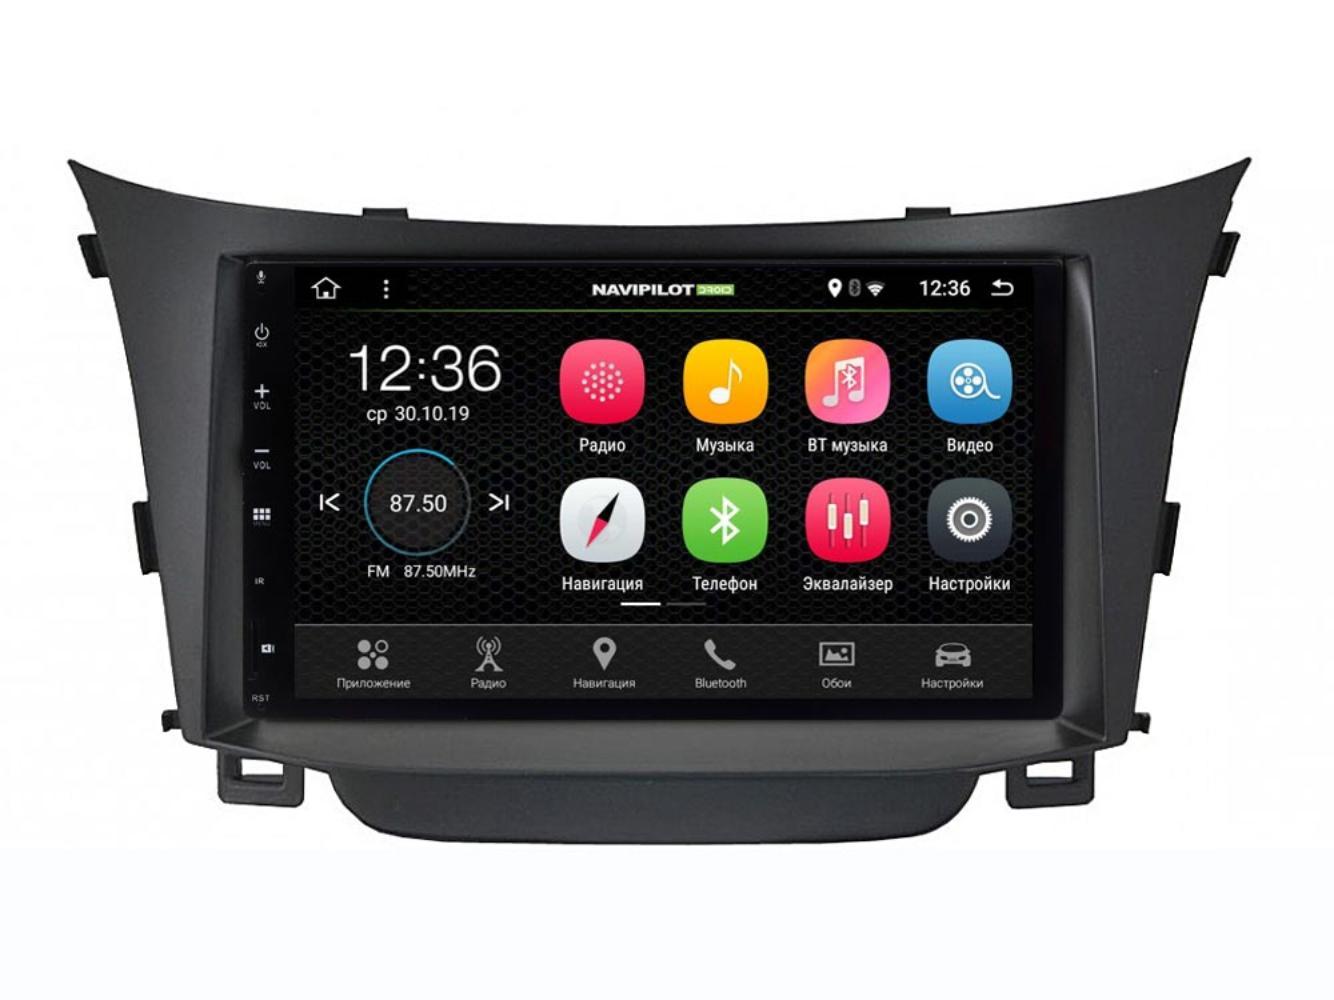 Автомагнитола NaviPilot DROID7L для Hyundai i30 2012 - 2016 (+ Камера заднего вида в подарок!)